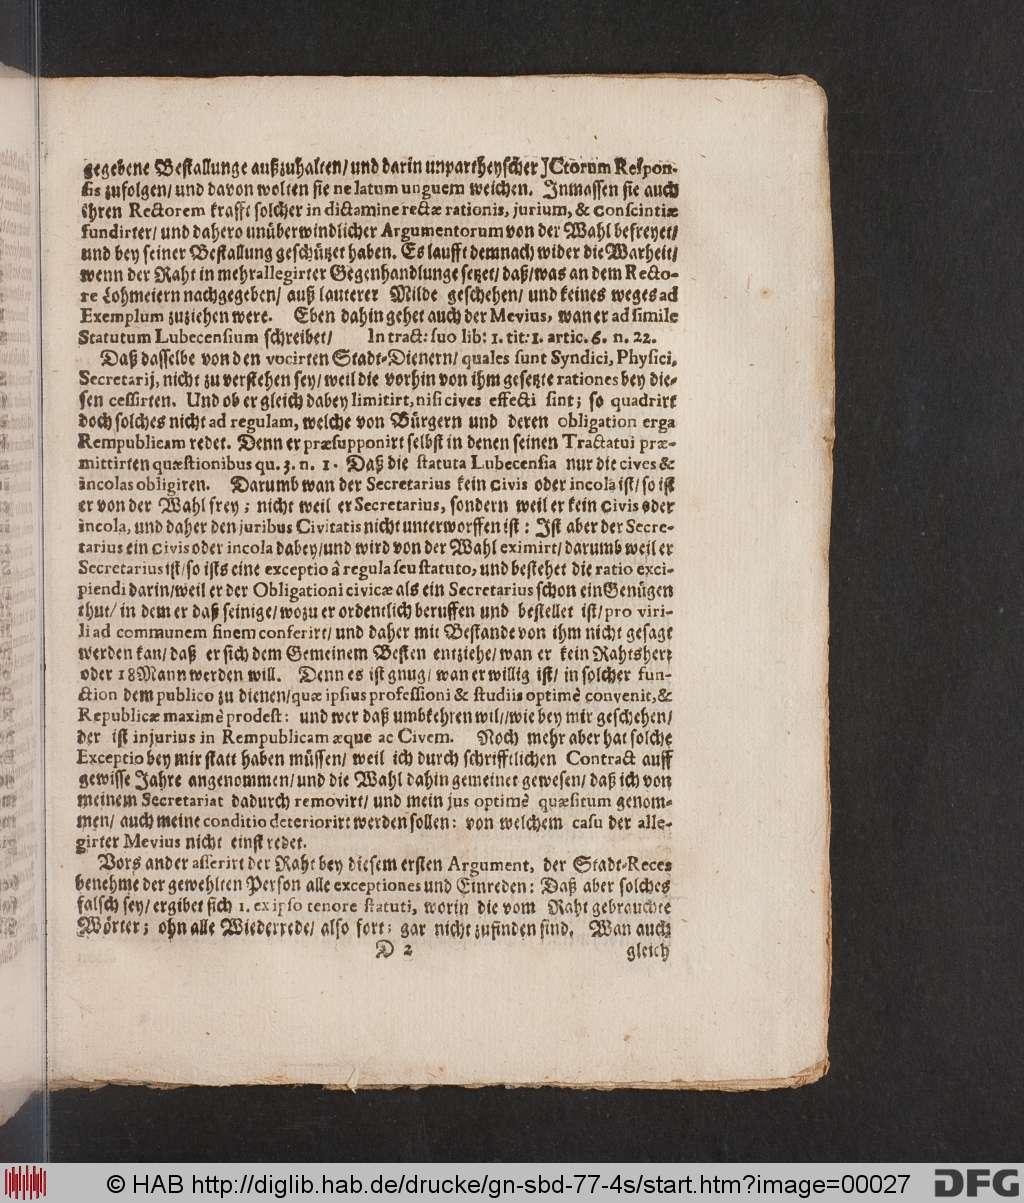 http://diglib.hab.de/drucke/gn-sbd-77-4s/00027.jpg